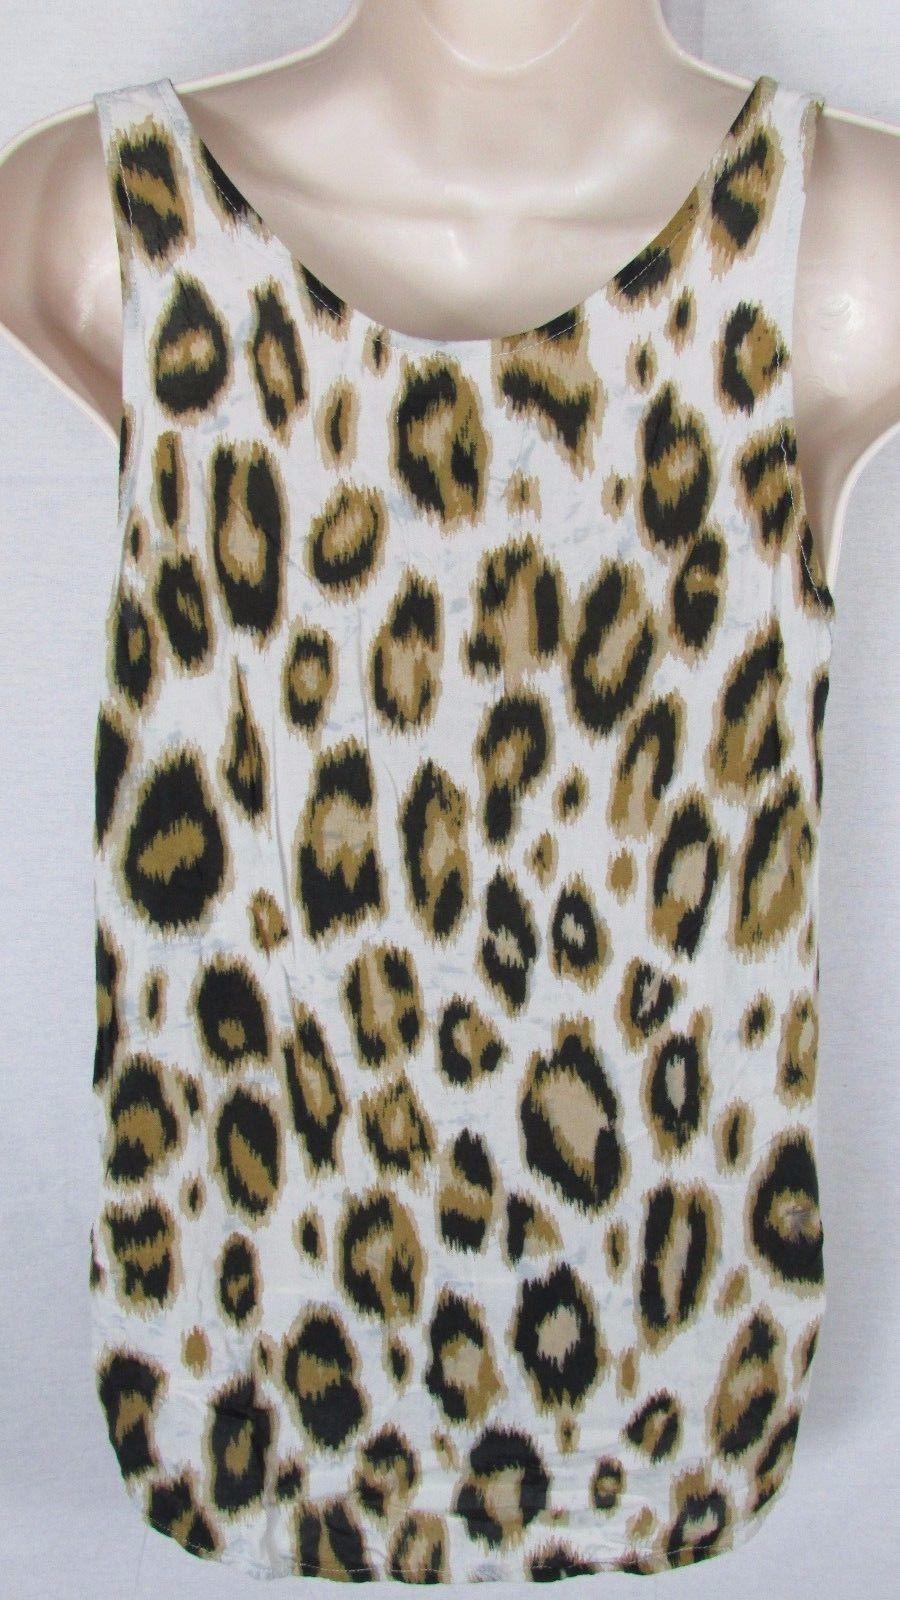 3eebc3e3359d66 S l1600. S l1600. Previous. women Old navy sheer Cream brown tan black  animal print rayon tank top Medium